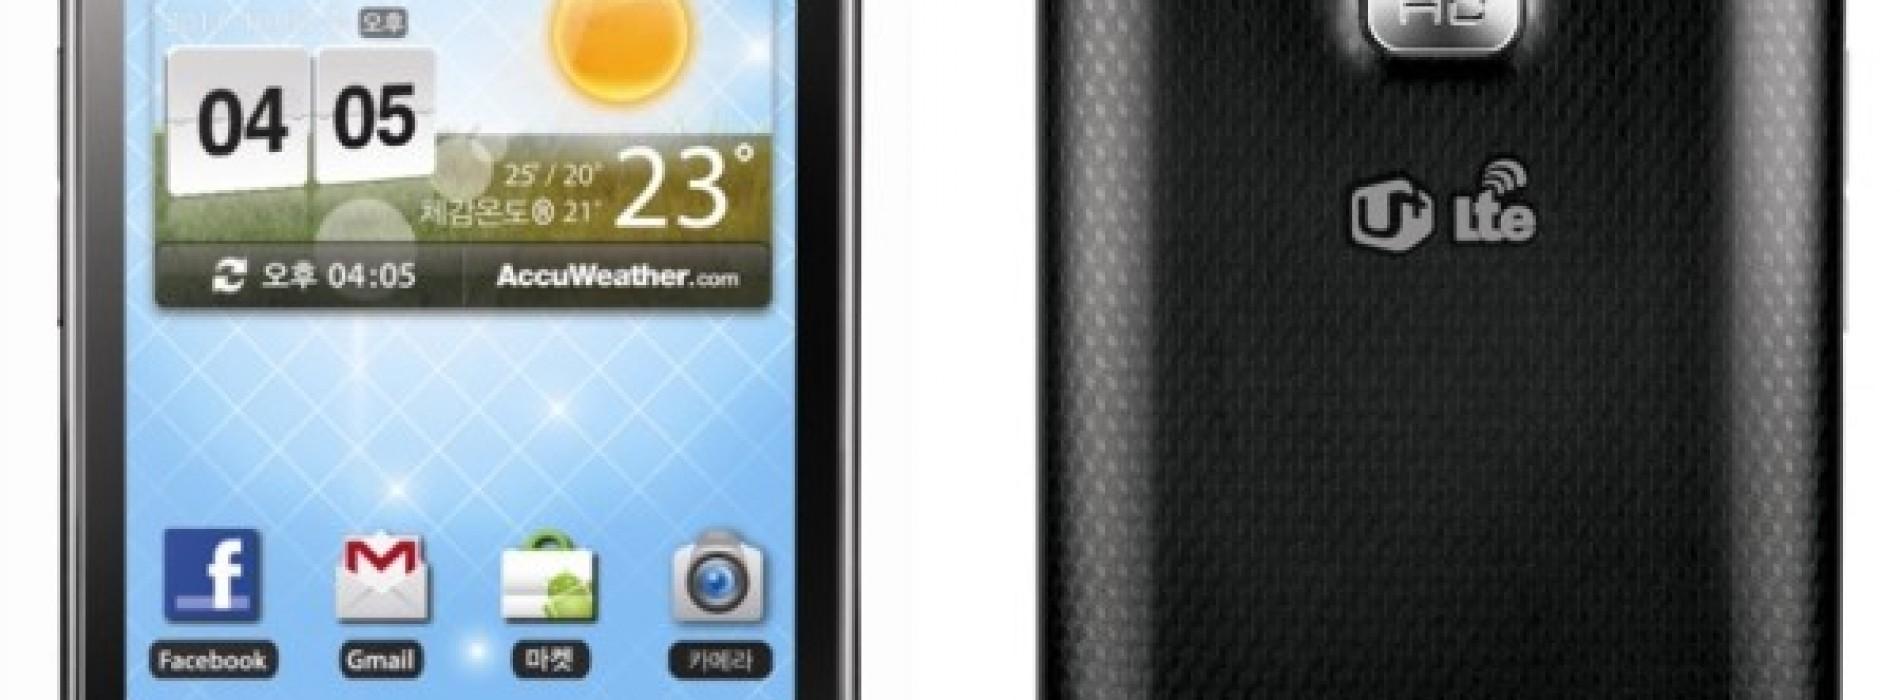 LG flaunts Optimus LTE sales, hopeful for similar results with Verizon Spectrum